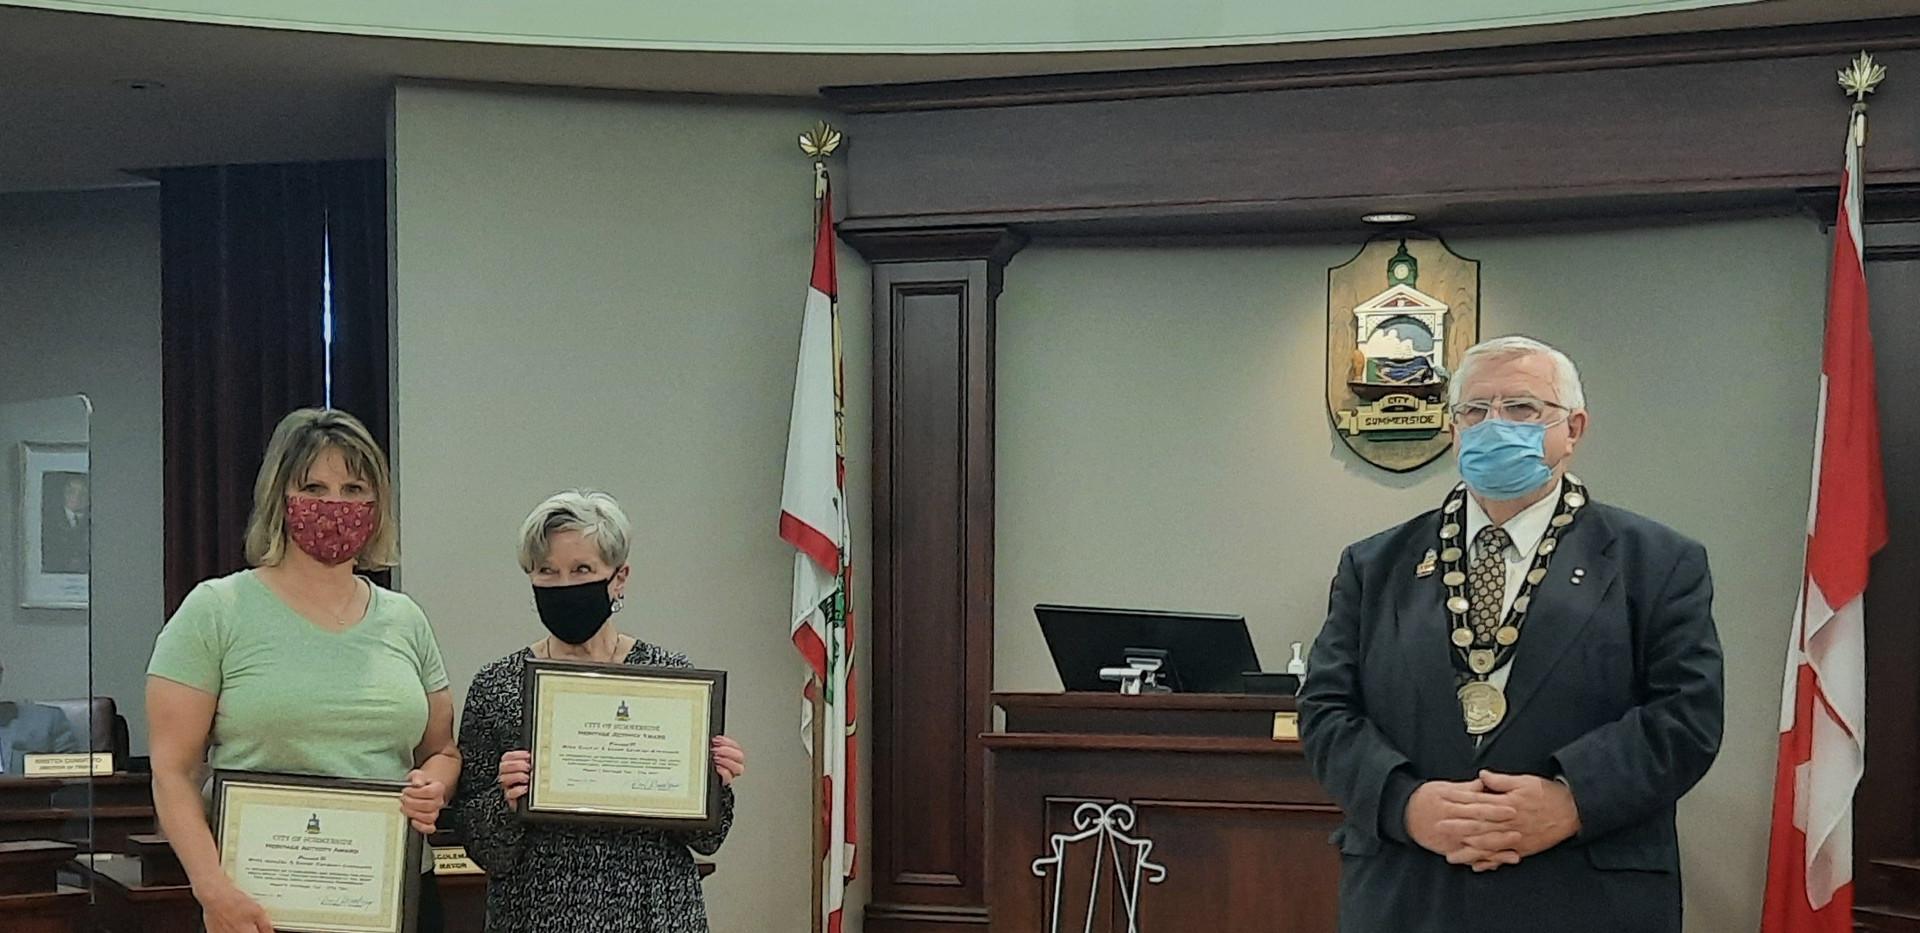 Mike Gaudet Gaudet and Susan Cormier-Arsenault - Heritage Activity Award